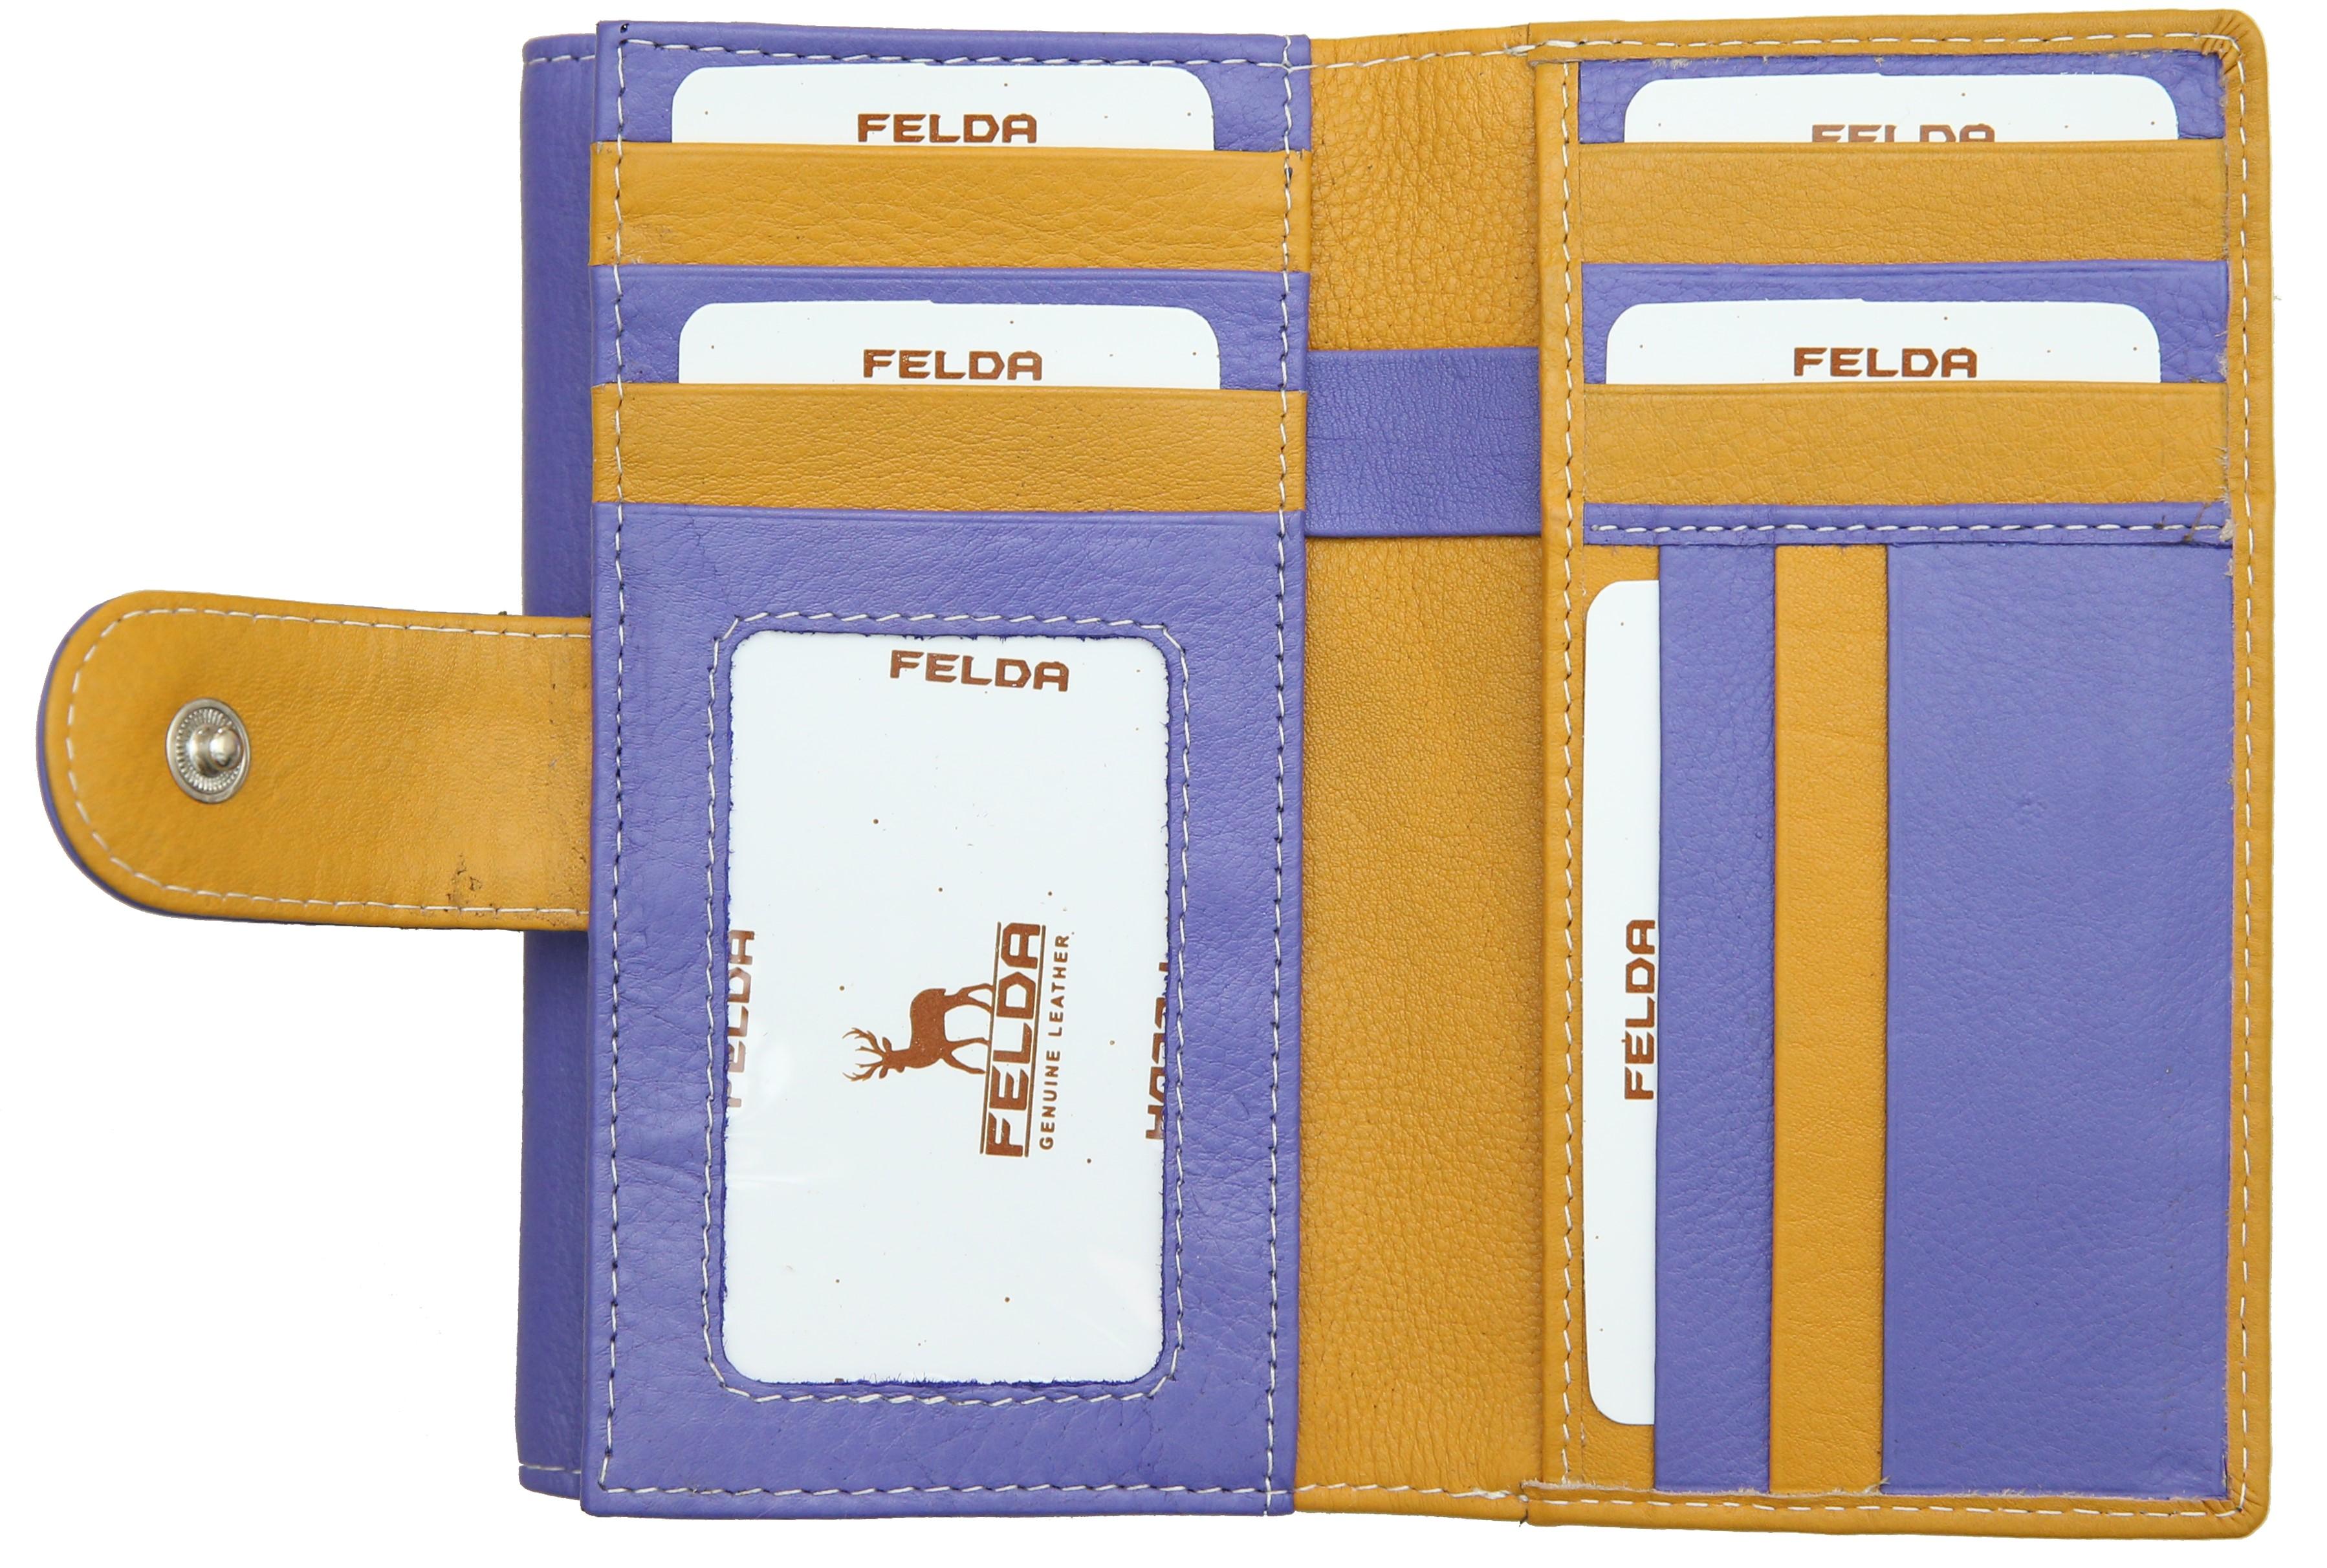 Felda-Portefeuille-pour-cartes-de-credit-cuir-souple-plusieurs-coloris miniature 35